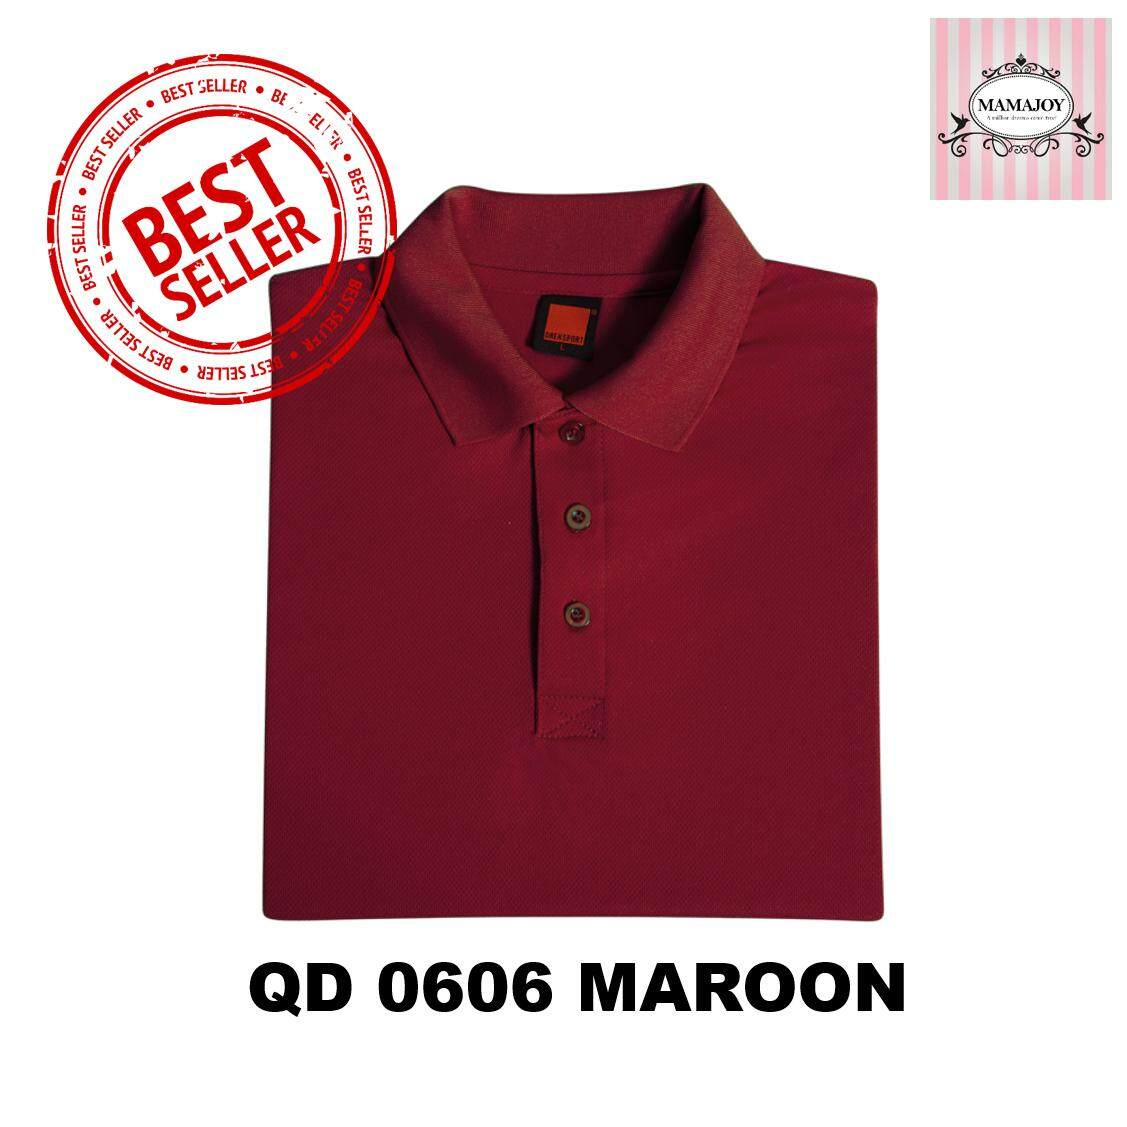 4cfea6f11 QD06 Oren Sport Unisex Polo Short Sleeve Jersey Tshirt Microfiber 160gsm